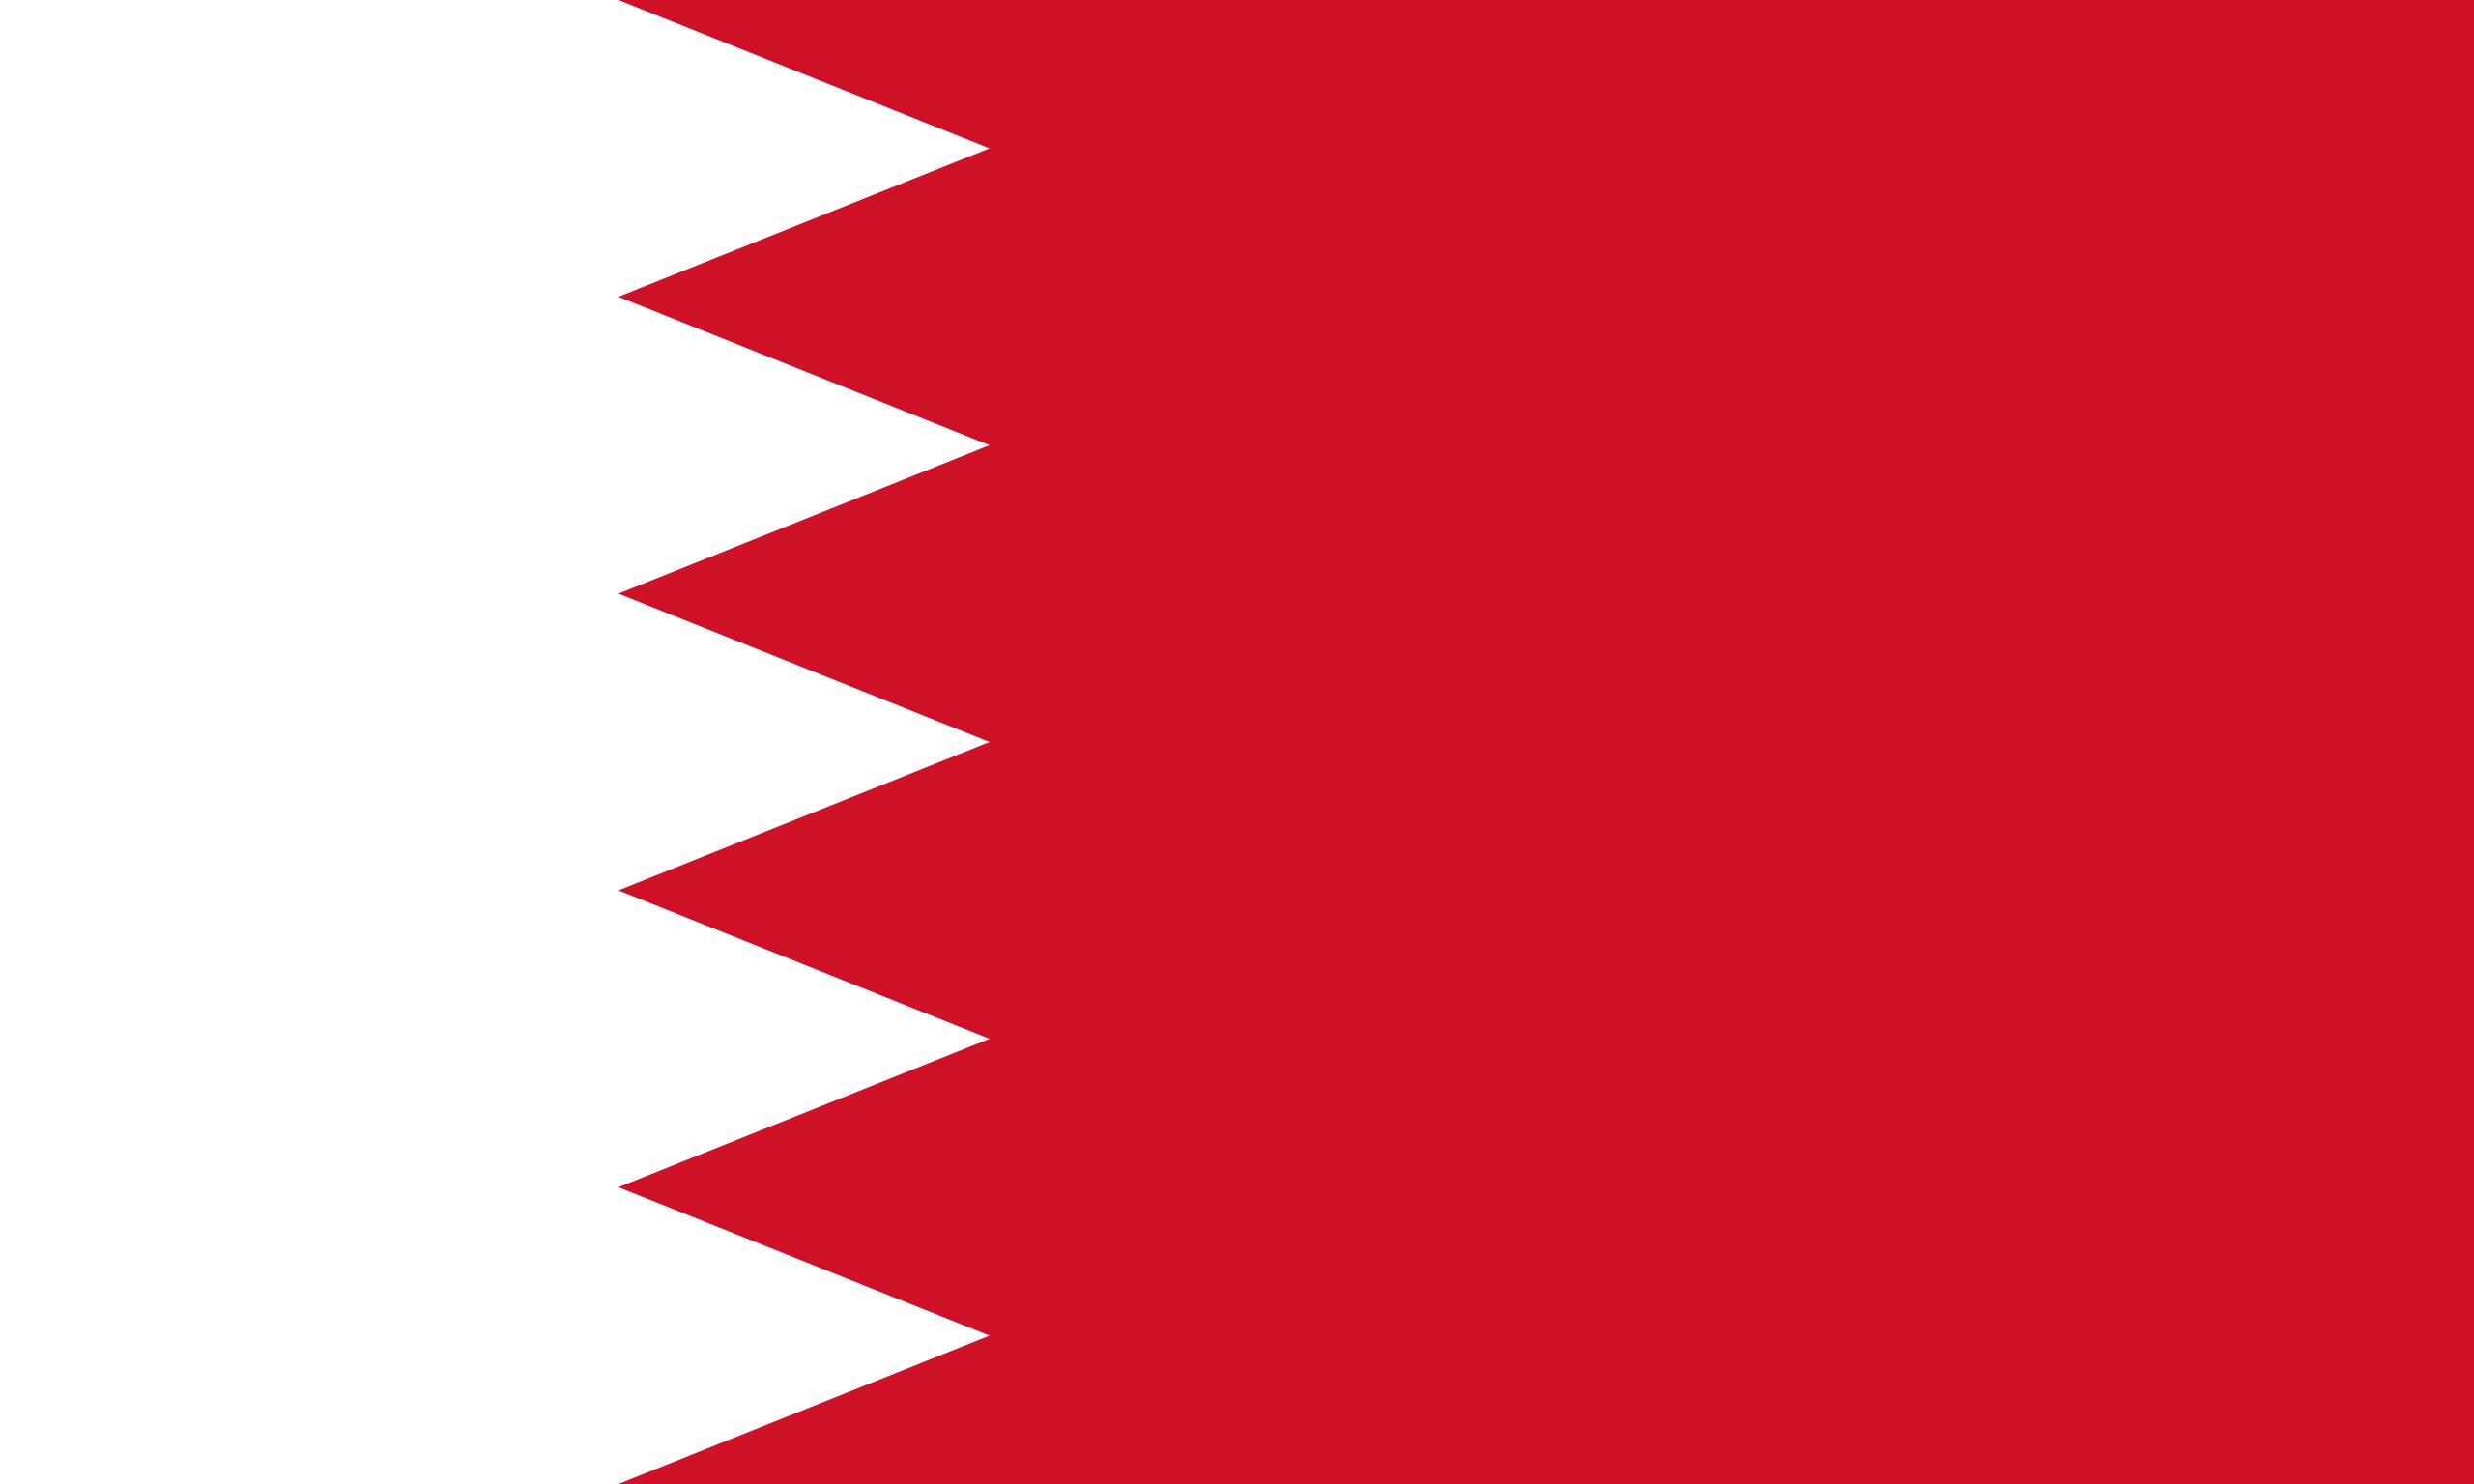 bahréin, país, emblema, insignia, símbolo - Fondos de Pantalla HD - professor-falken.com